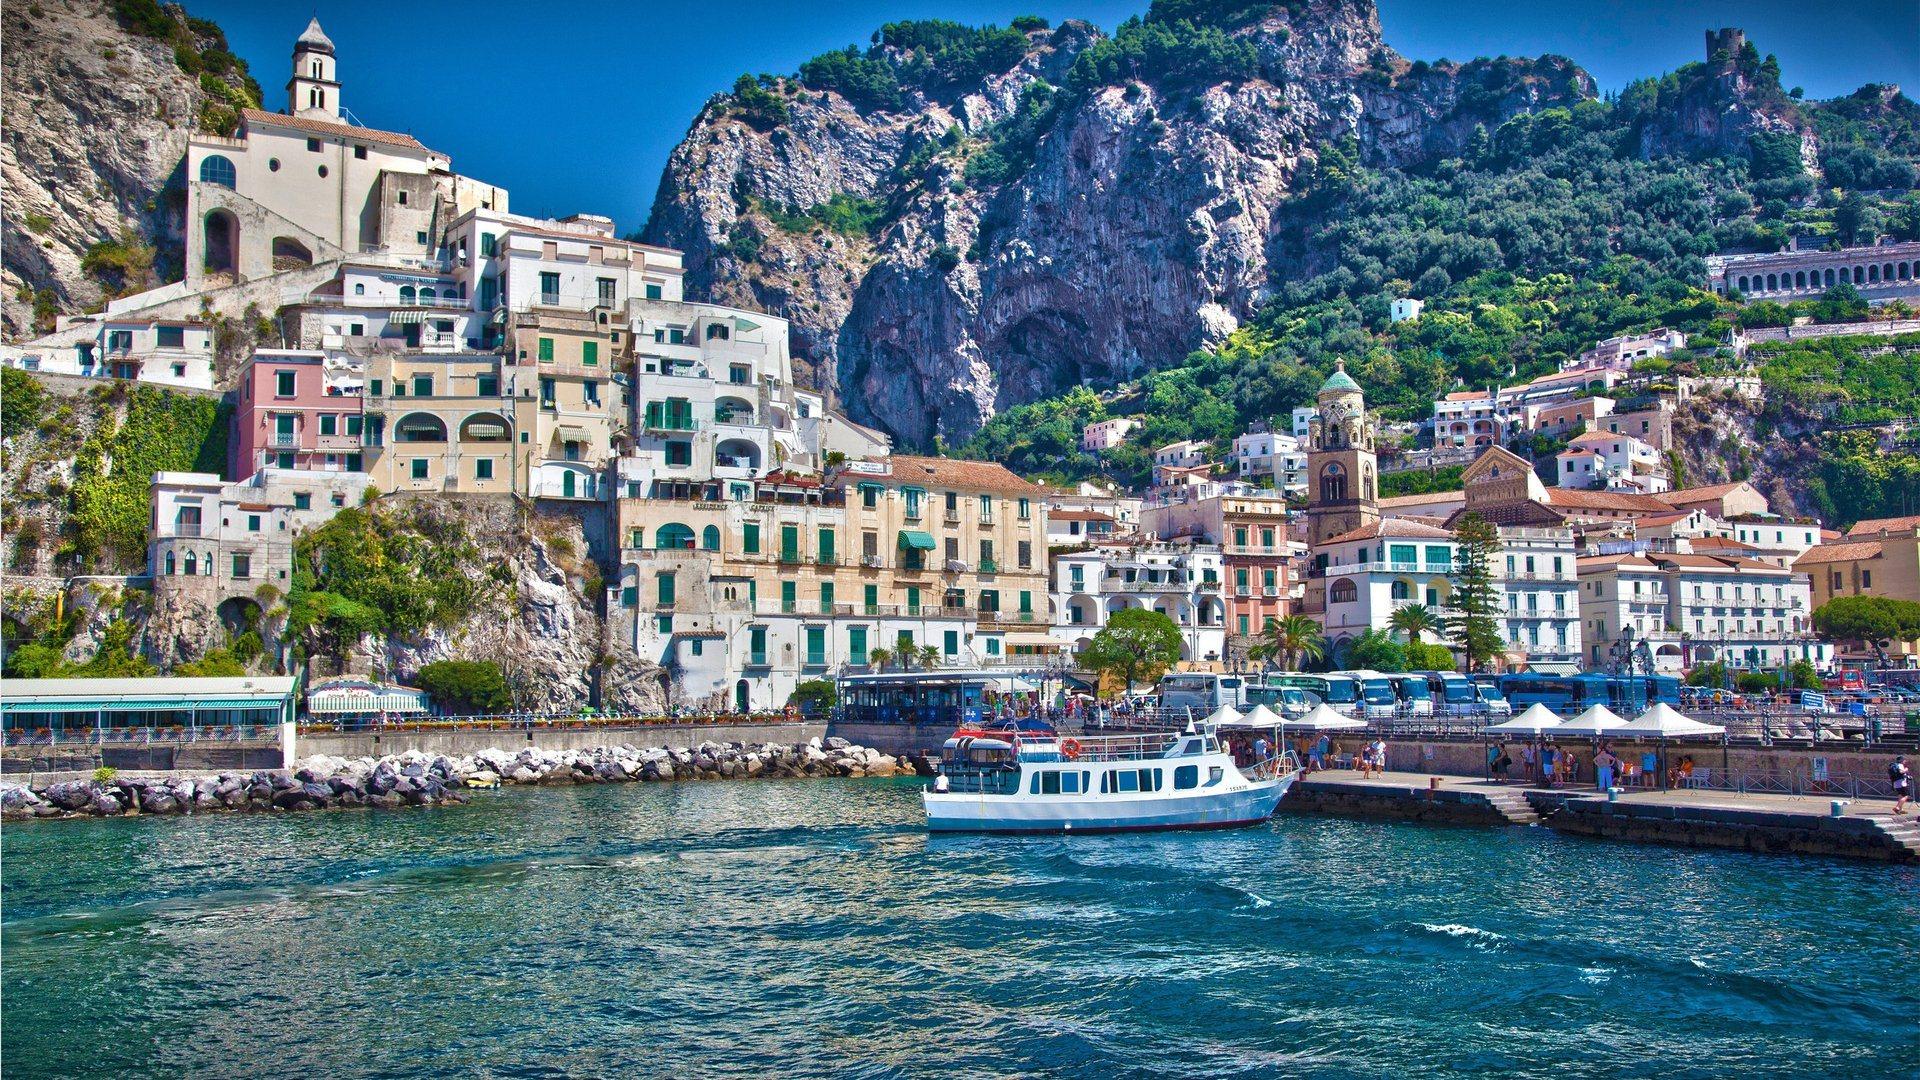 Amalfi Salerno Italy Full HD Desktop Wallpapers 1080p 1920x1080